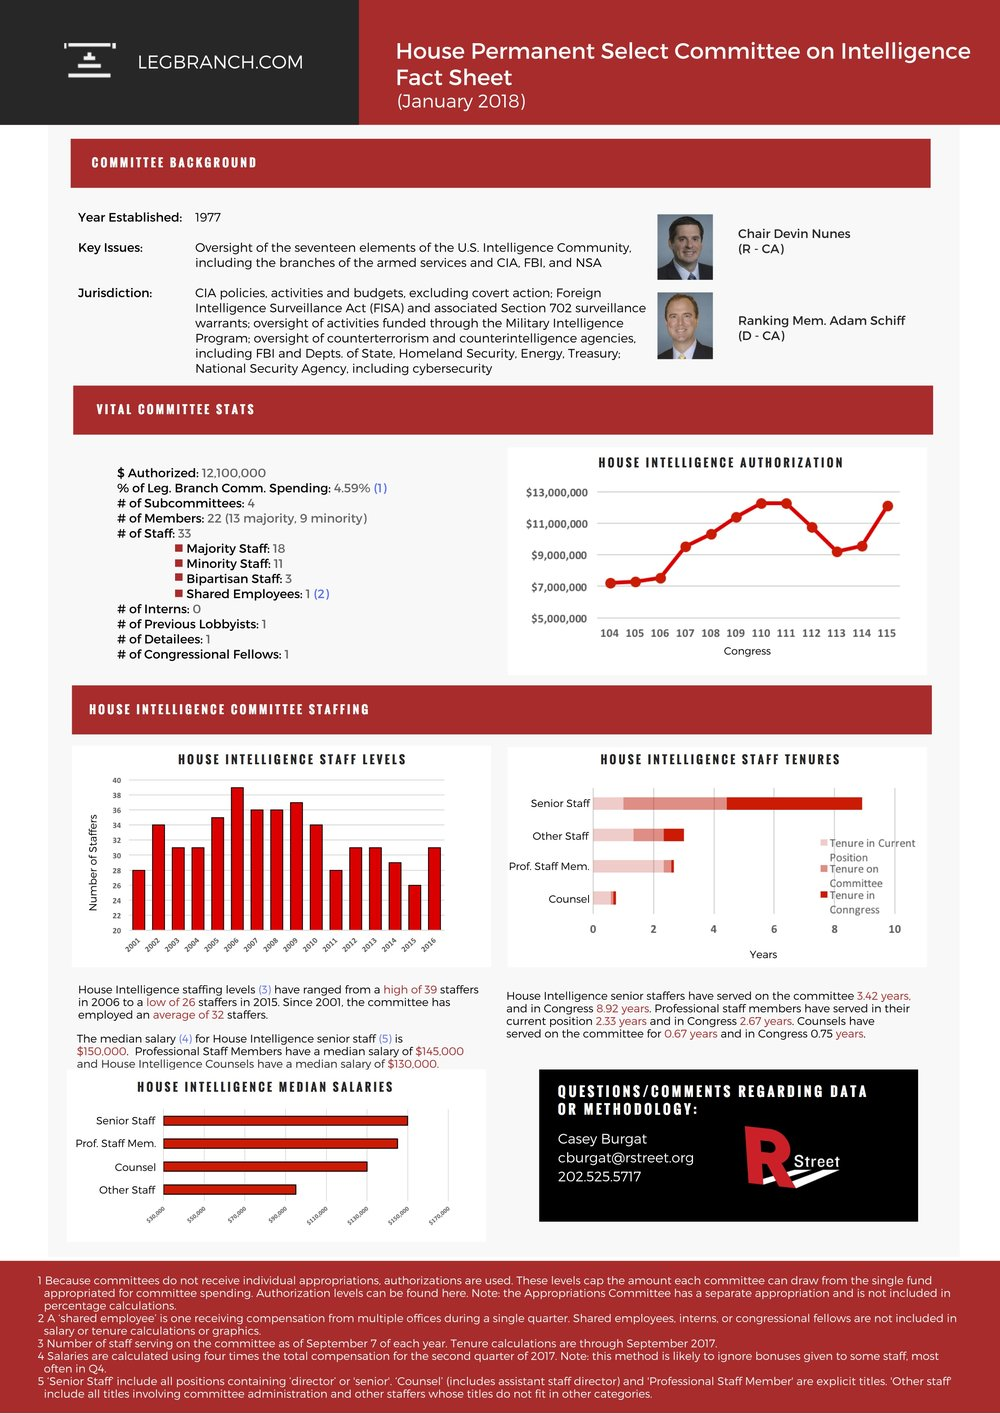 House Intelligence Committee Fact Sheet_Final.jpg